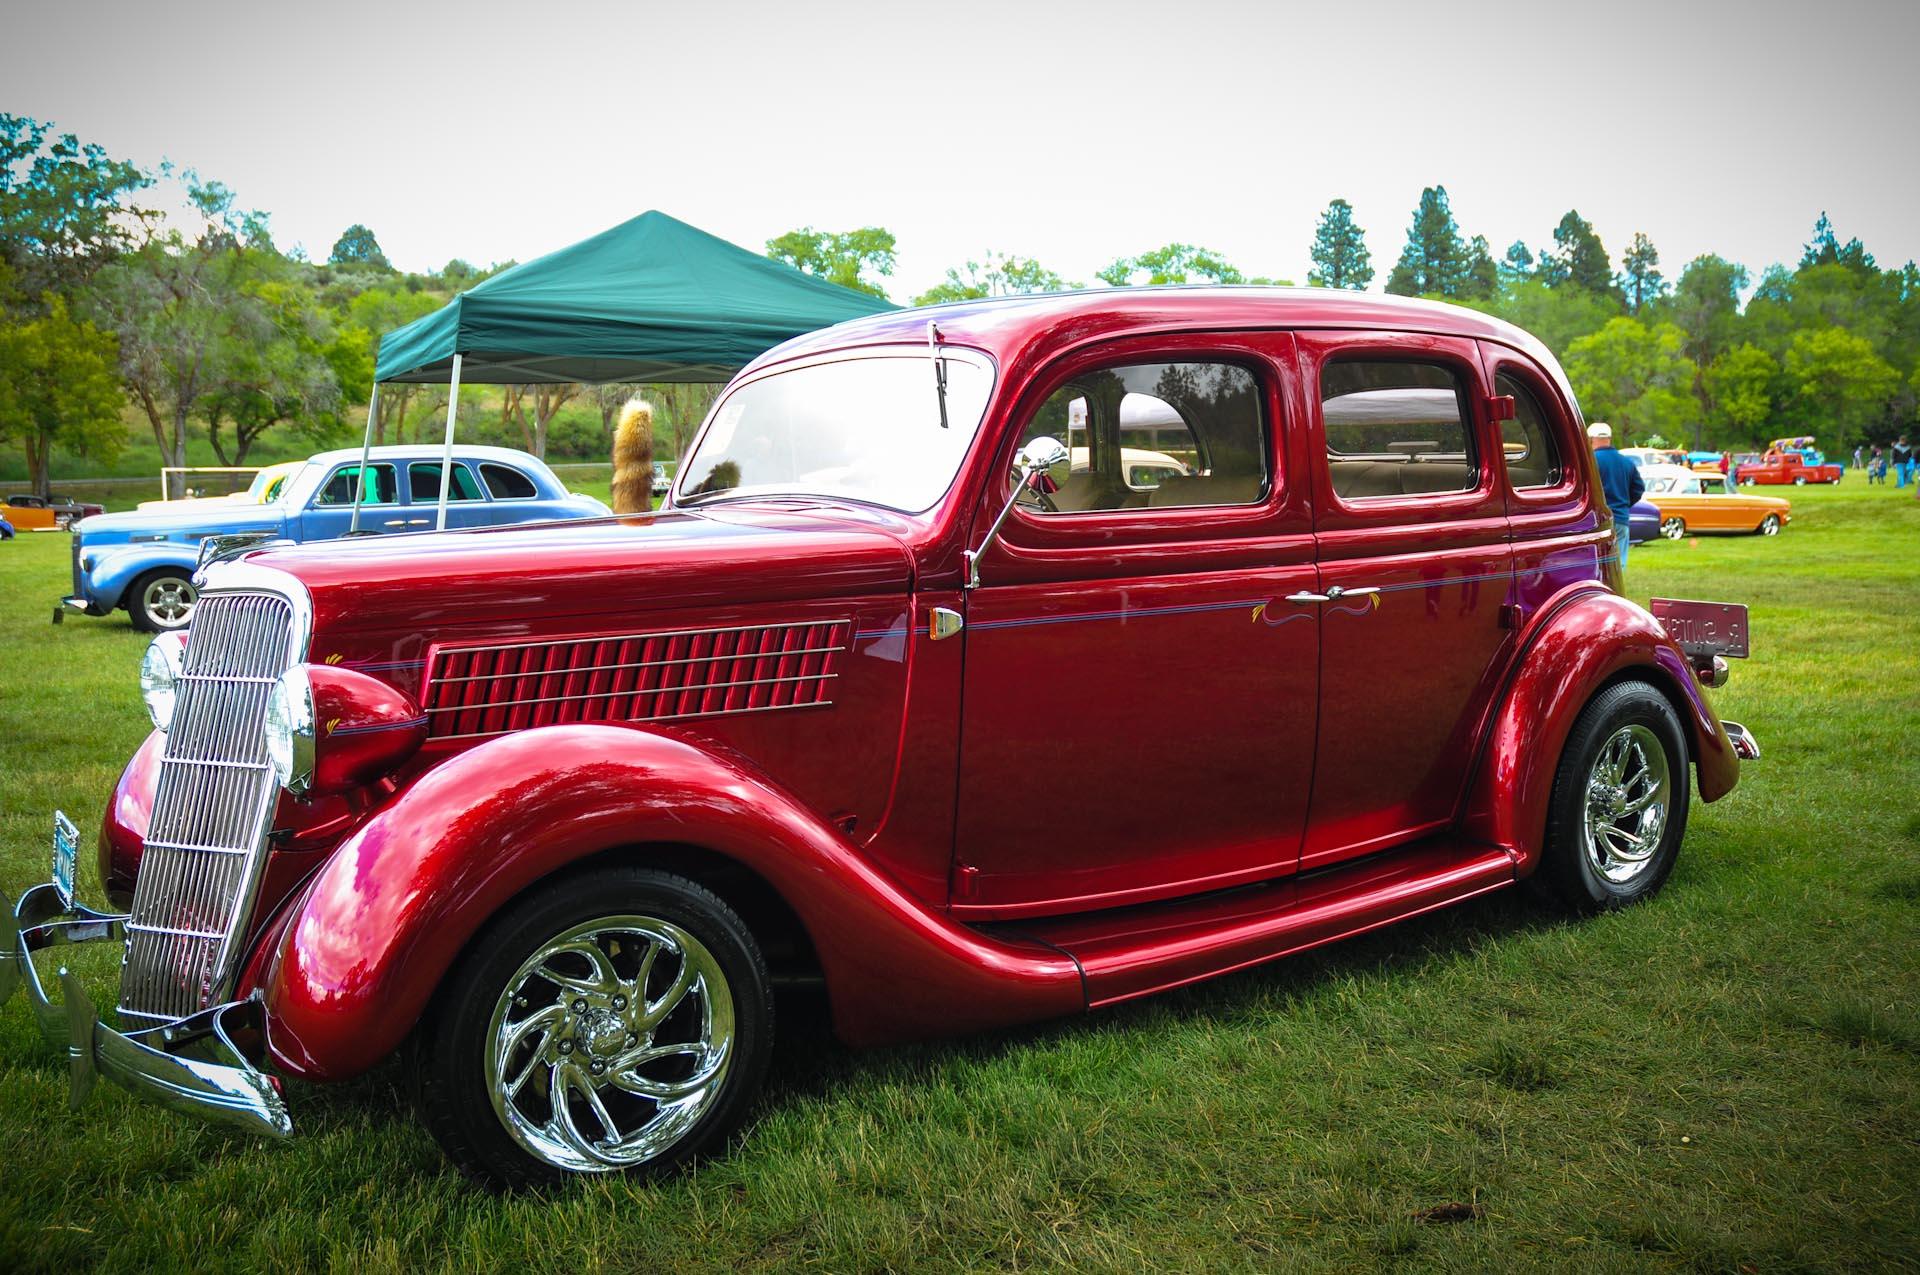 2012 Best of Show Joe & Eileen Bigotti Sparks, Nevada 1935 Ford Sedan